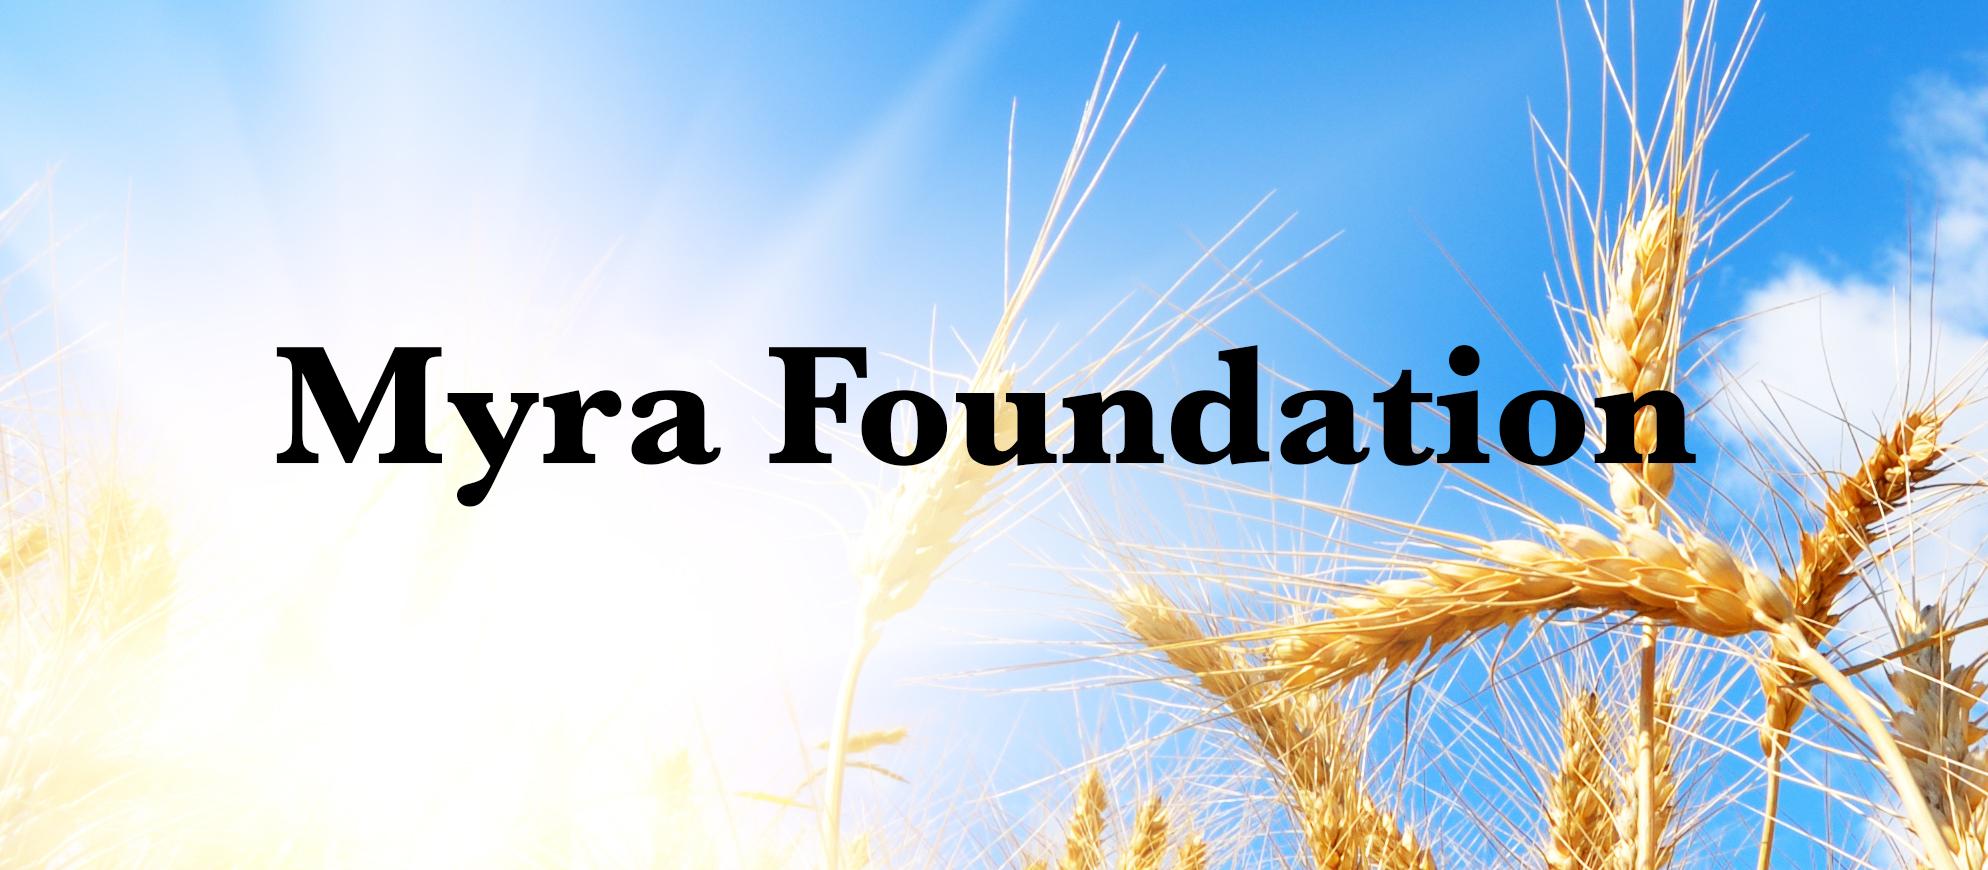 Myra Foundation